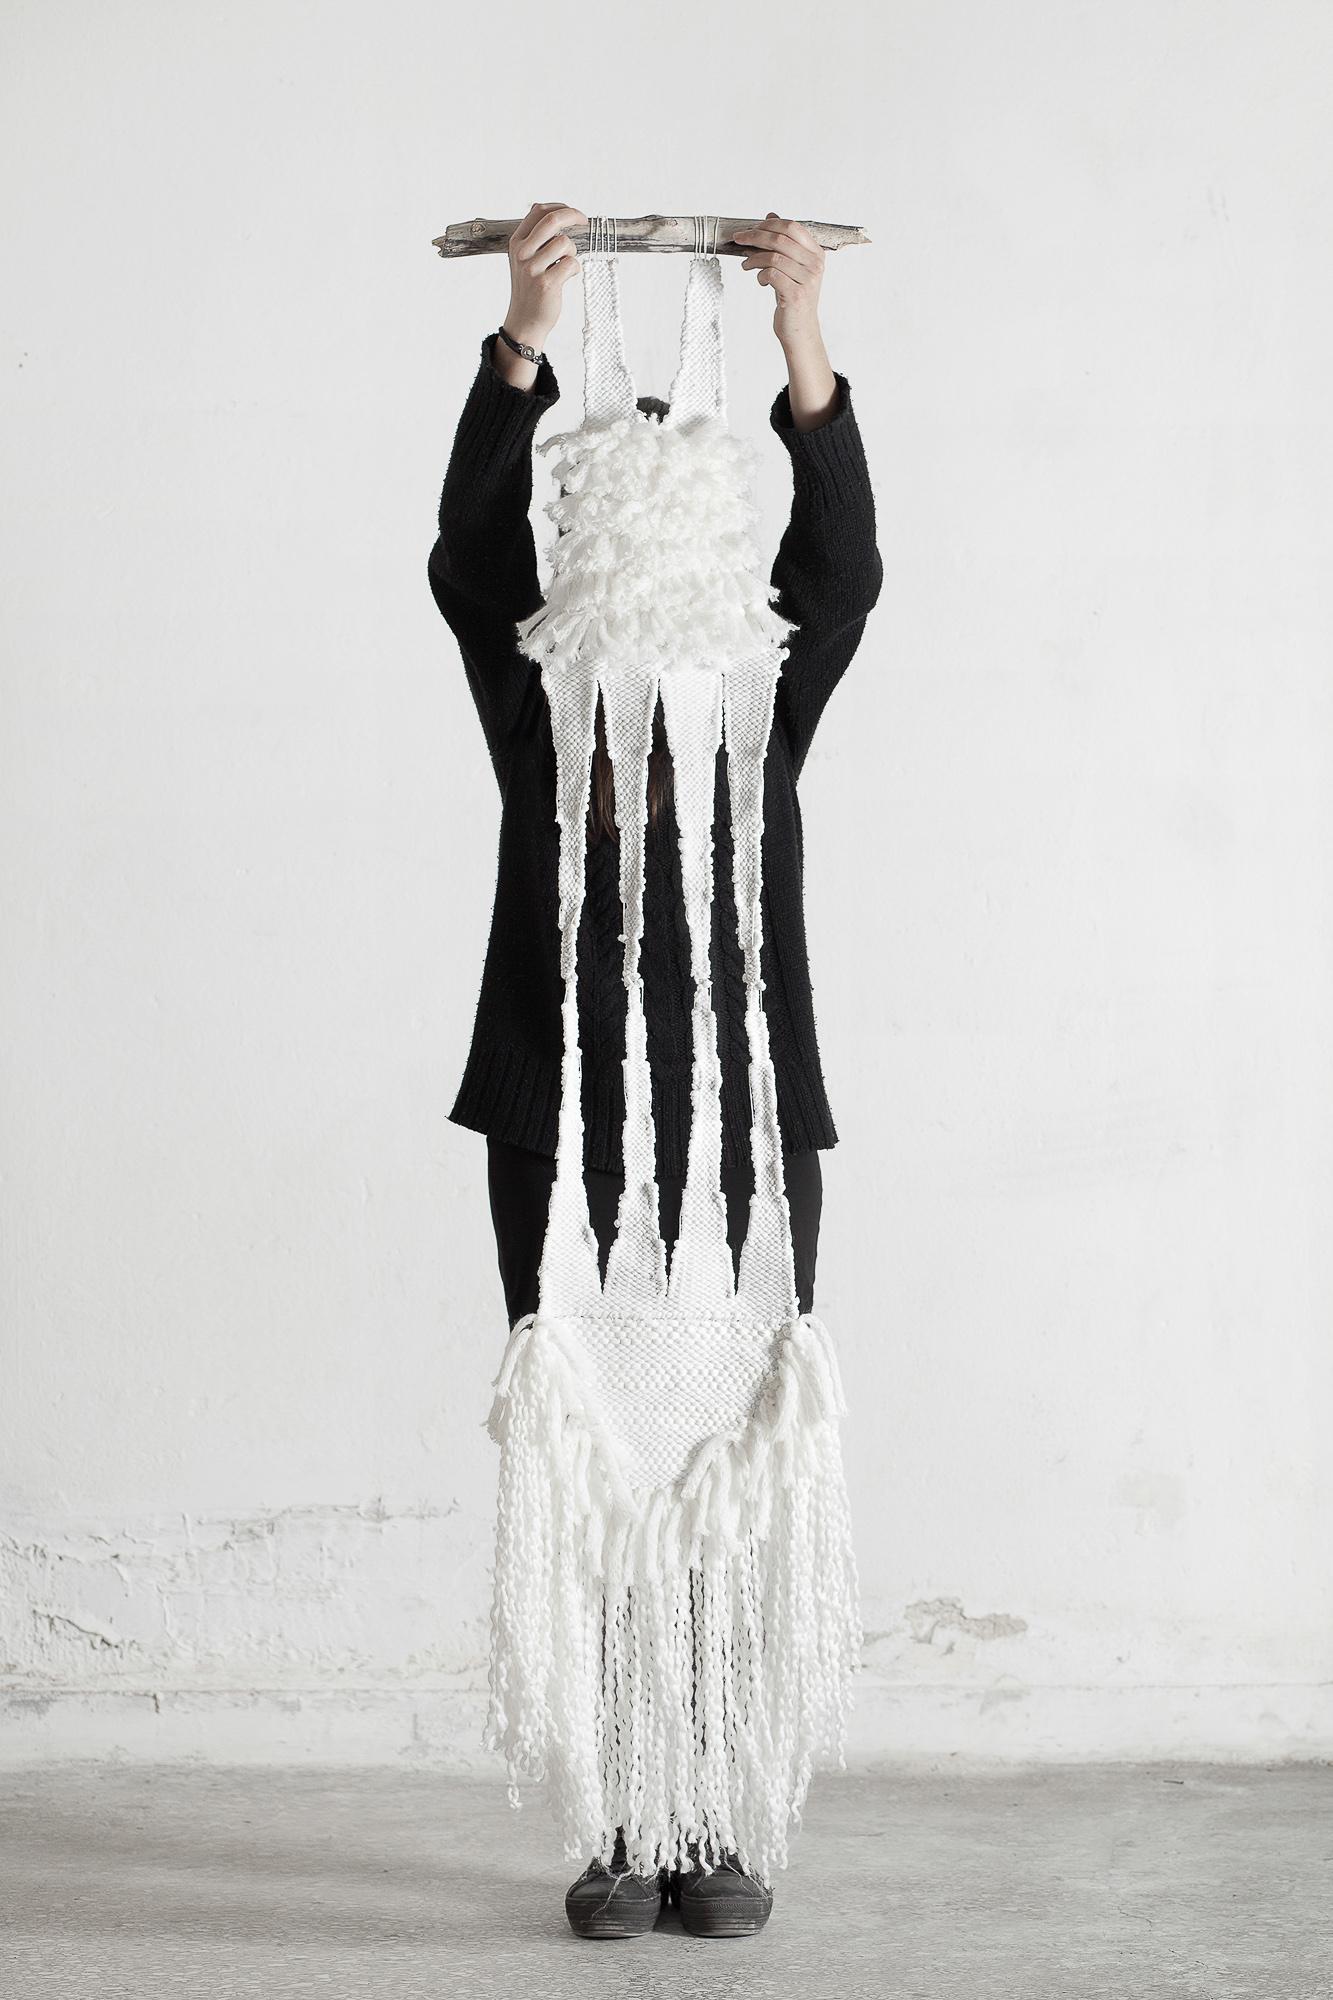 Sofia Kokkinis | Artist